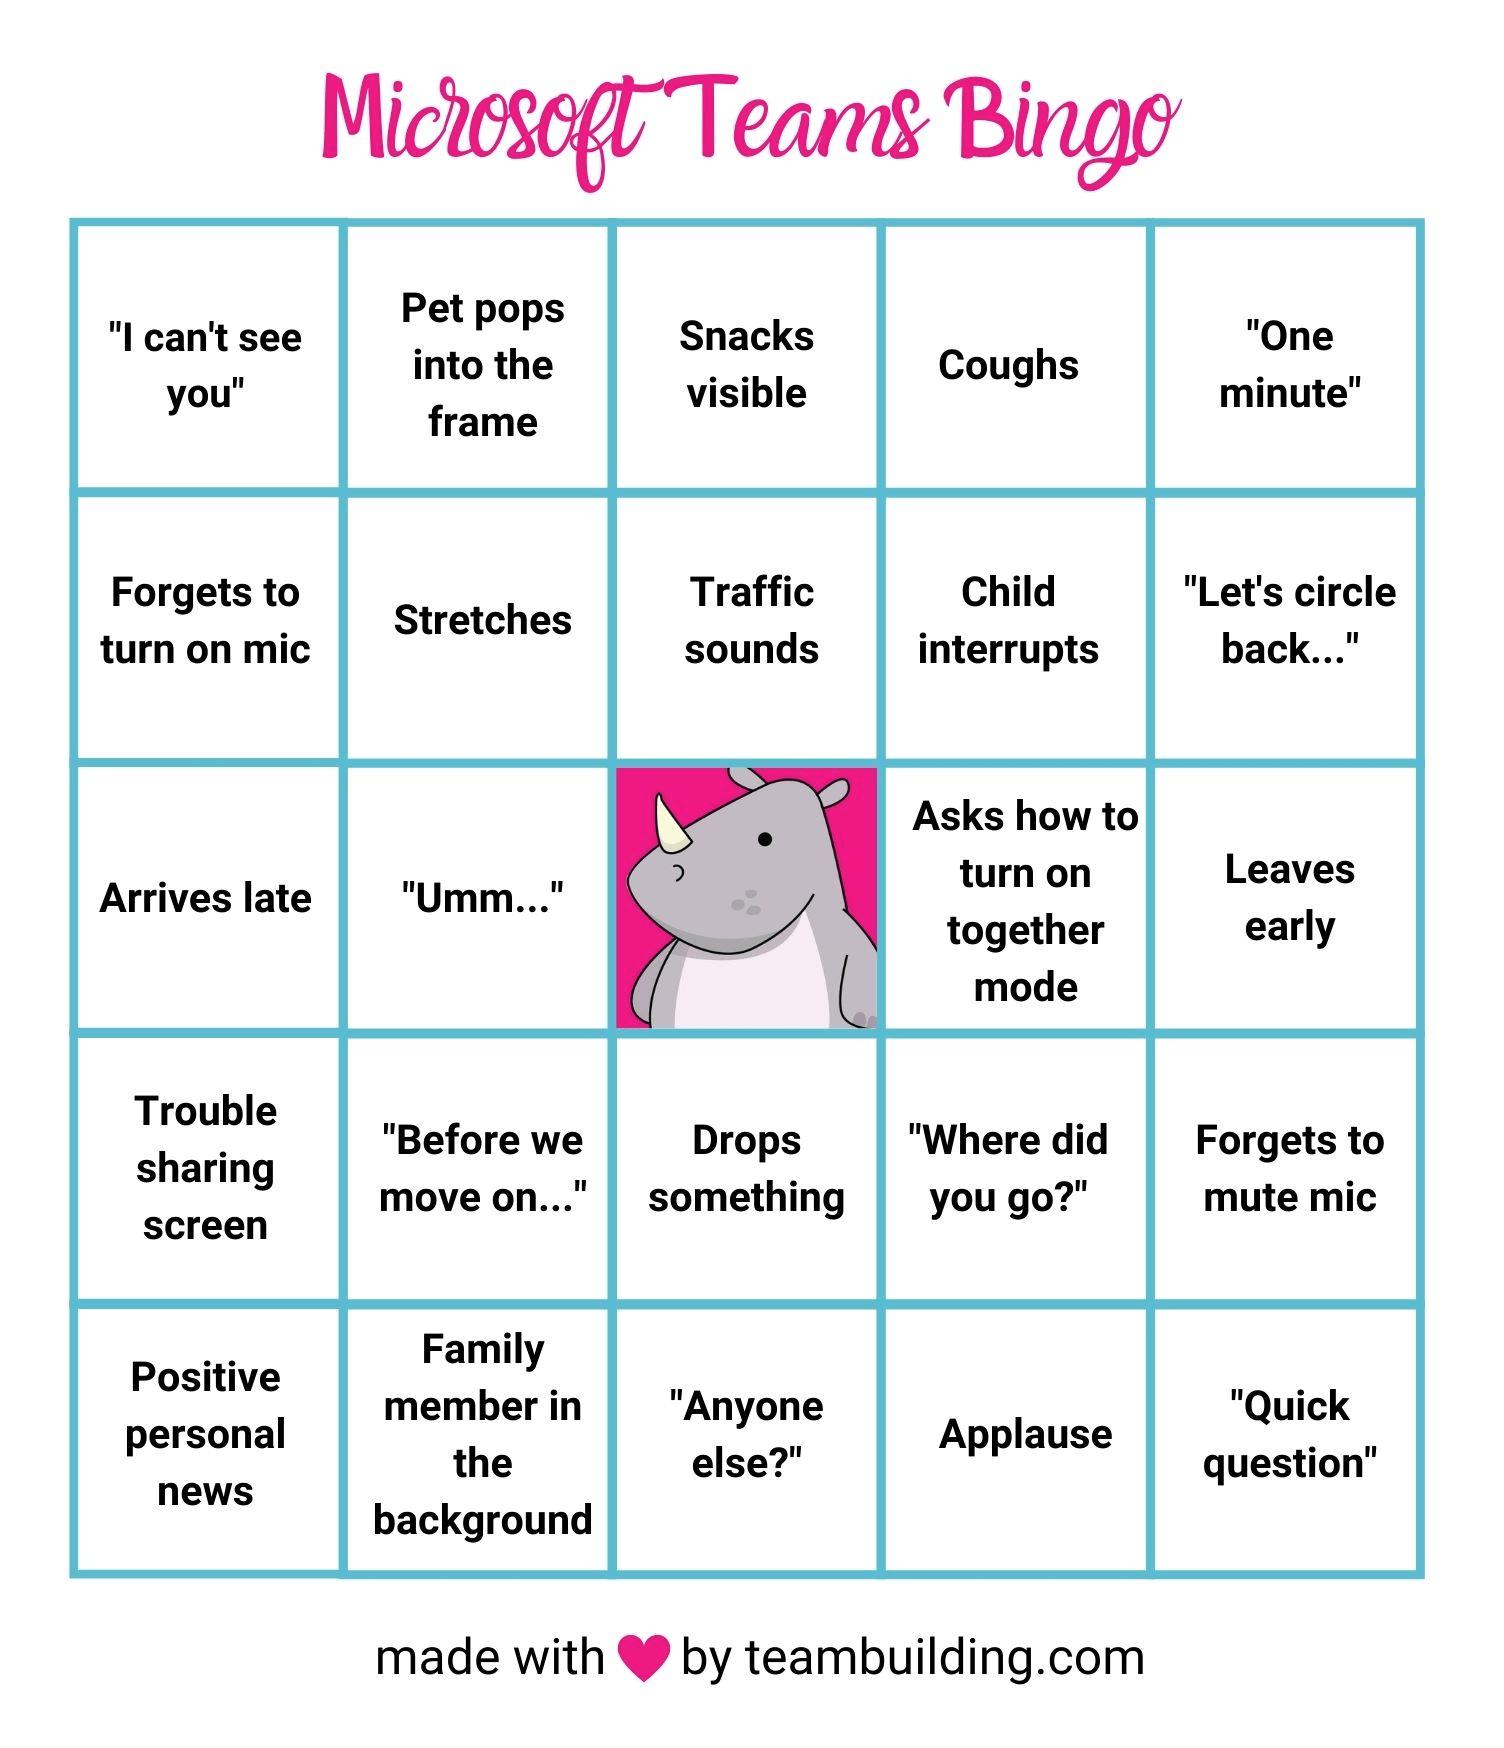 Microsoft Teams Bingo template